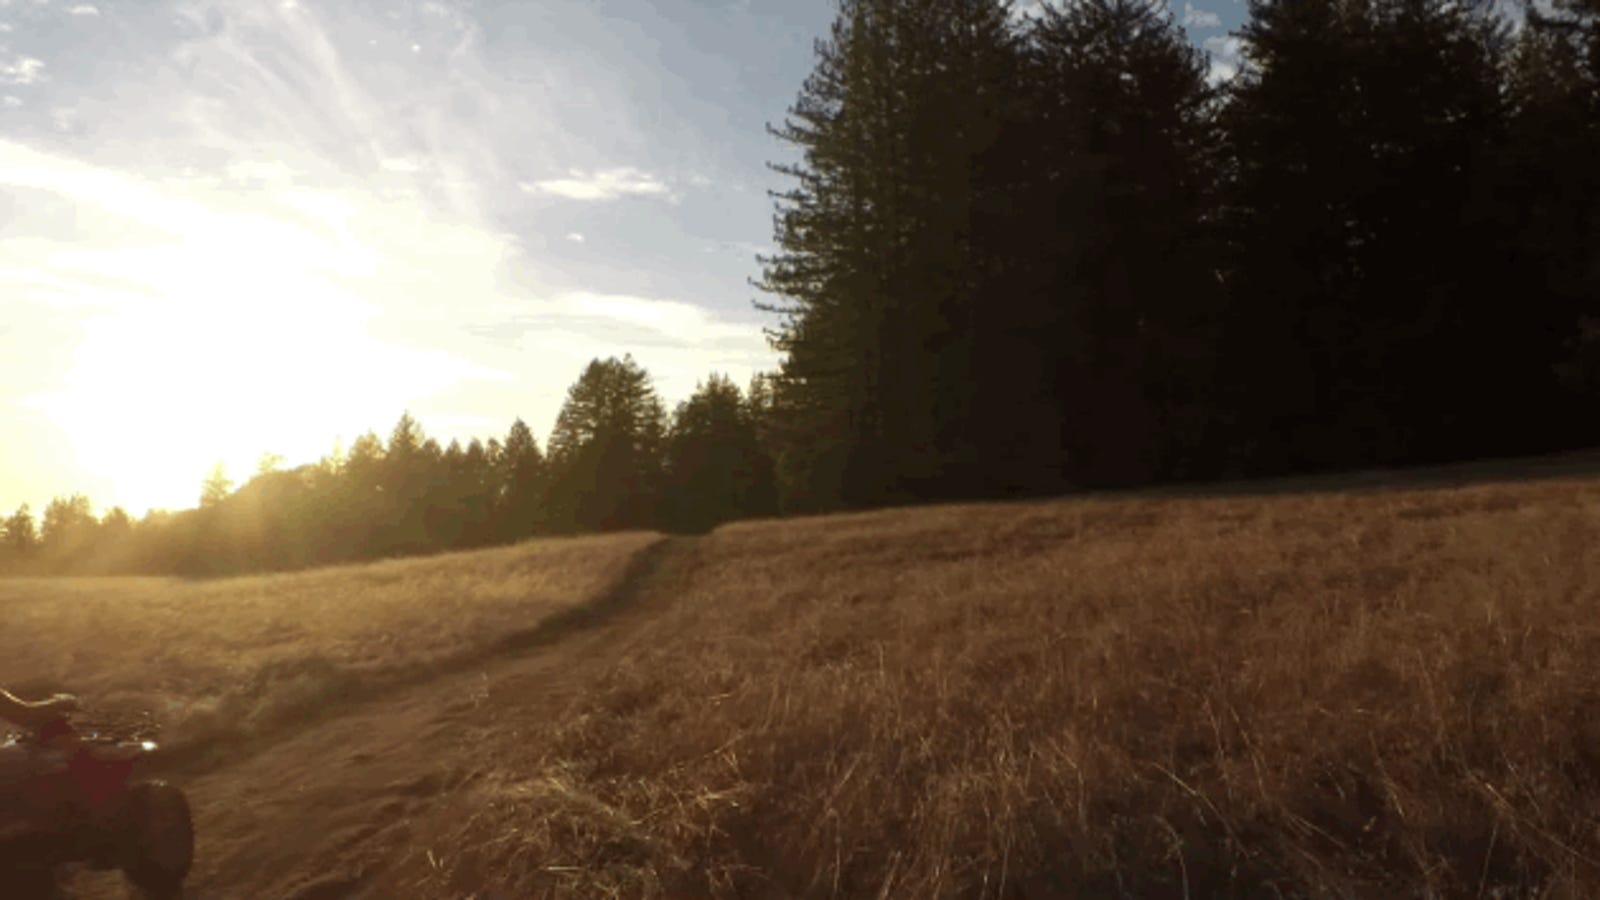 GoPro's Experimental Drone Footage Looks Pretty Damn Good